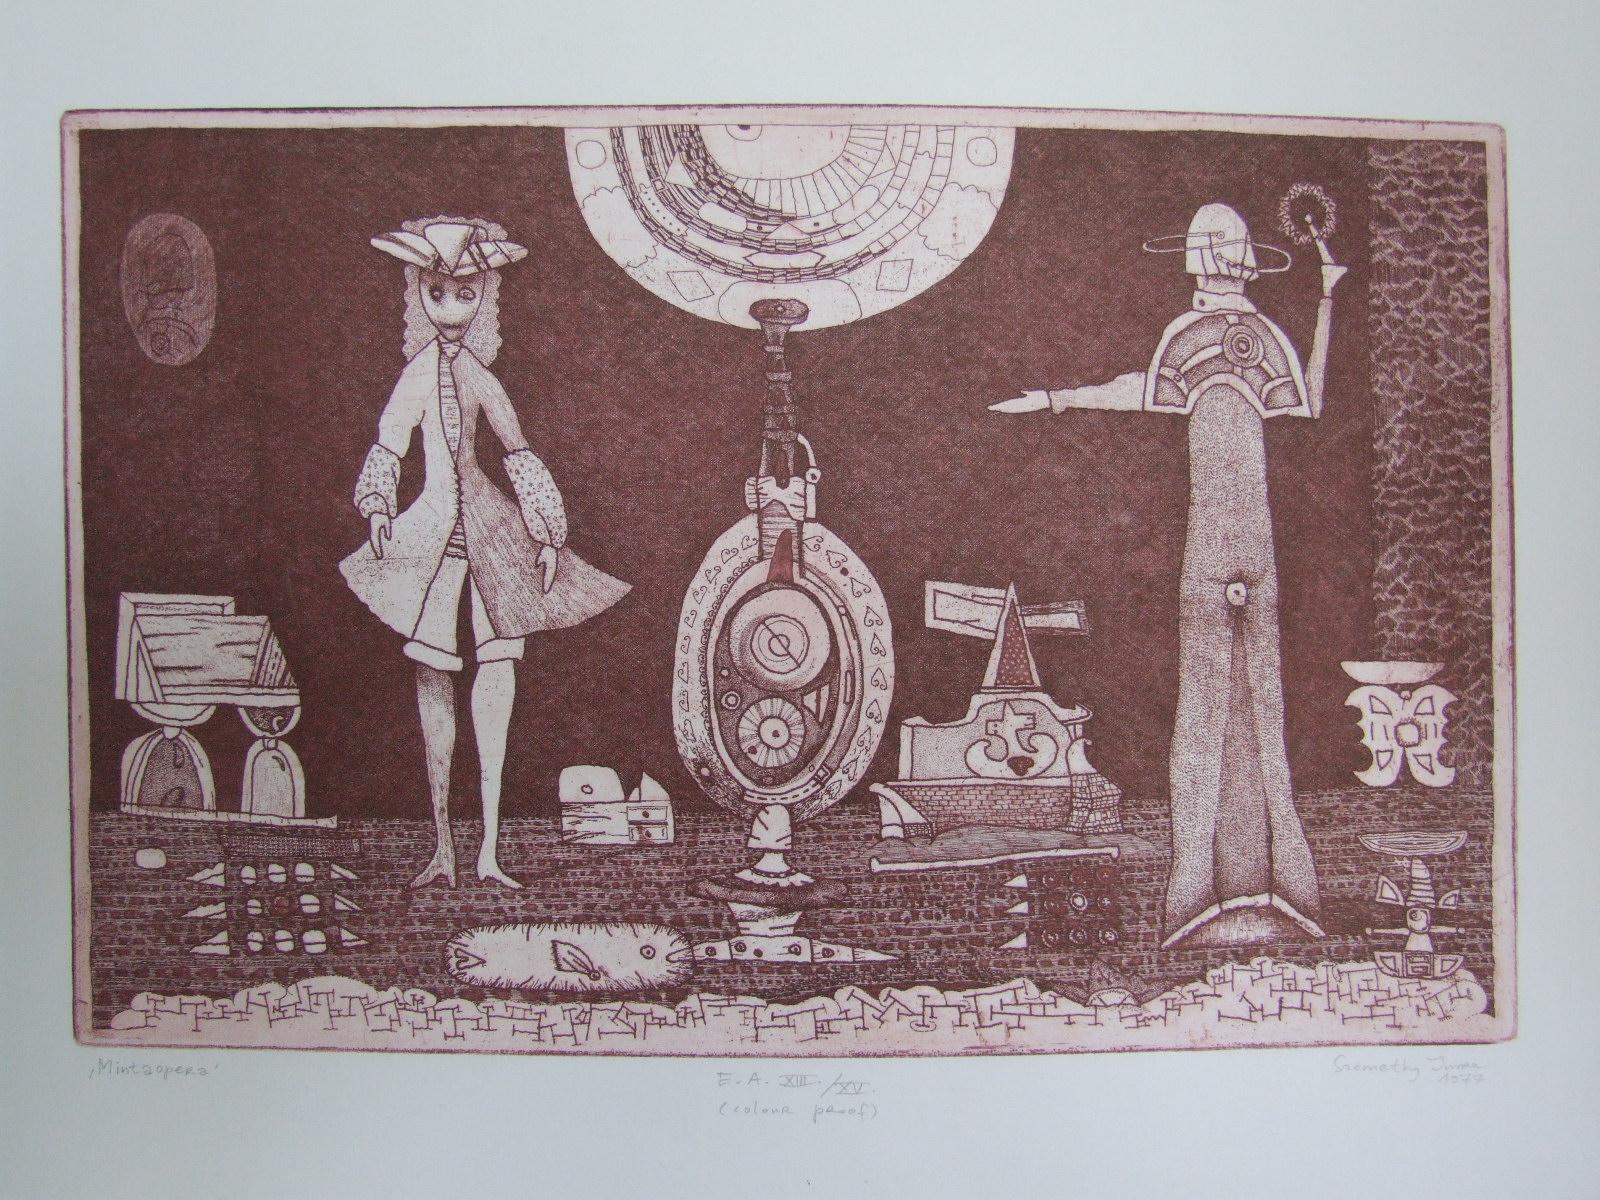 Szemethy, Imre: Model opera